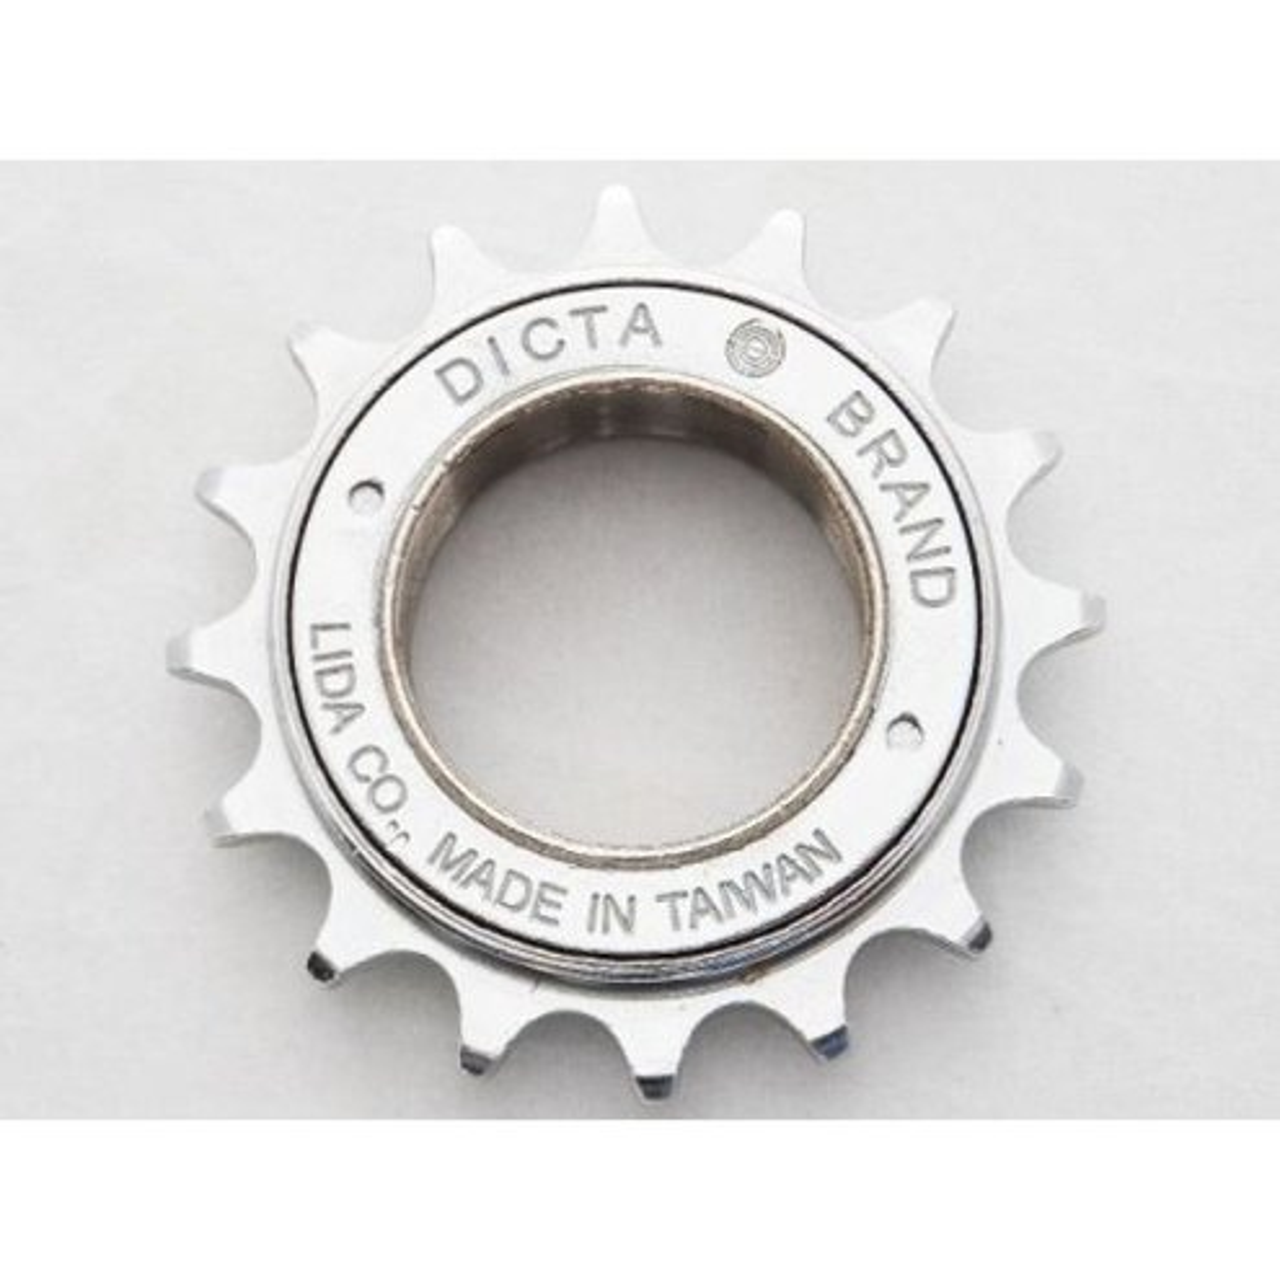 CATRACA 16D DICTA BMX CROMADA PARA CORRENTE FINA